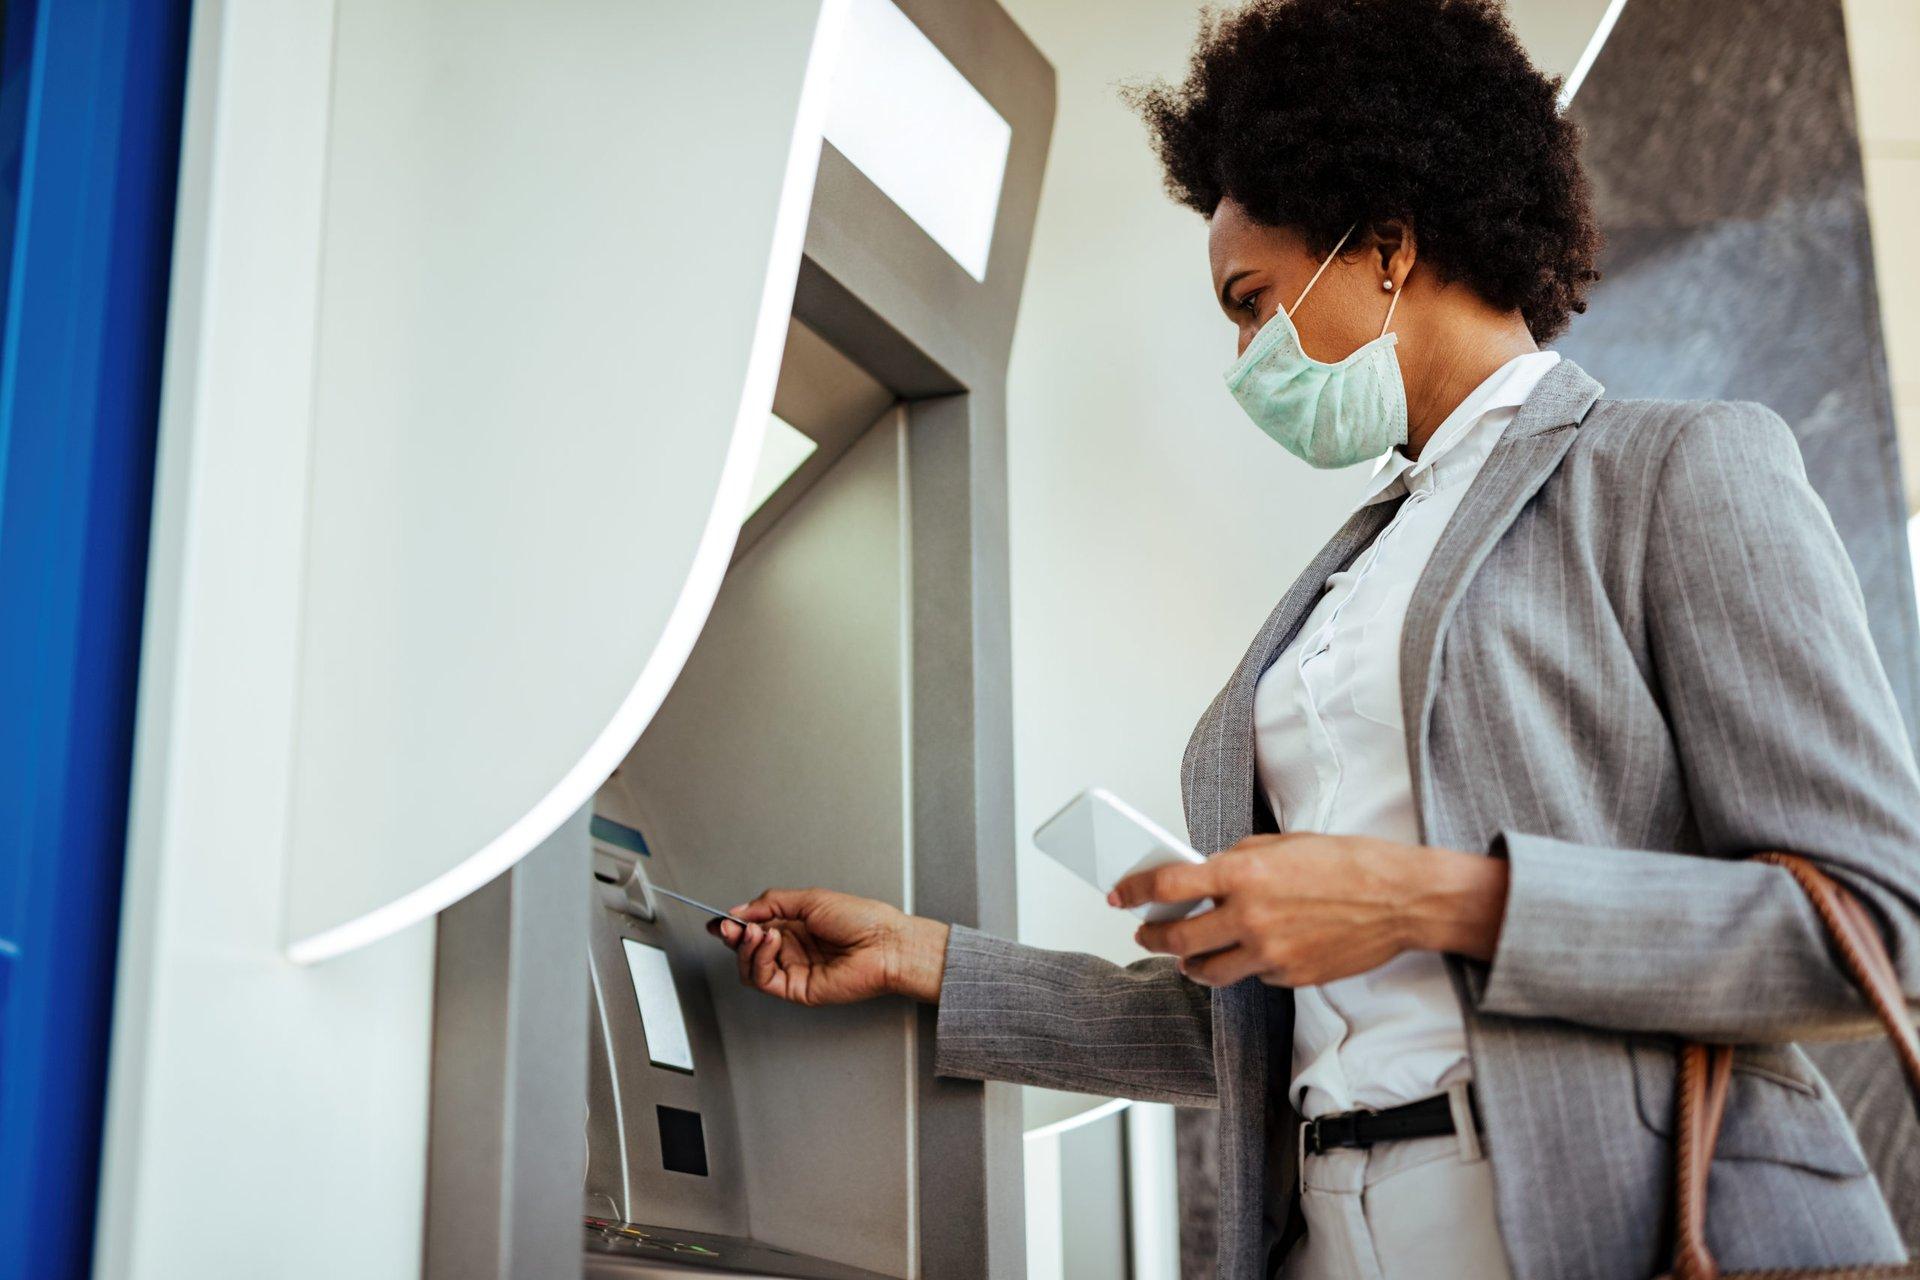 Woman withdrawing stimulus money